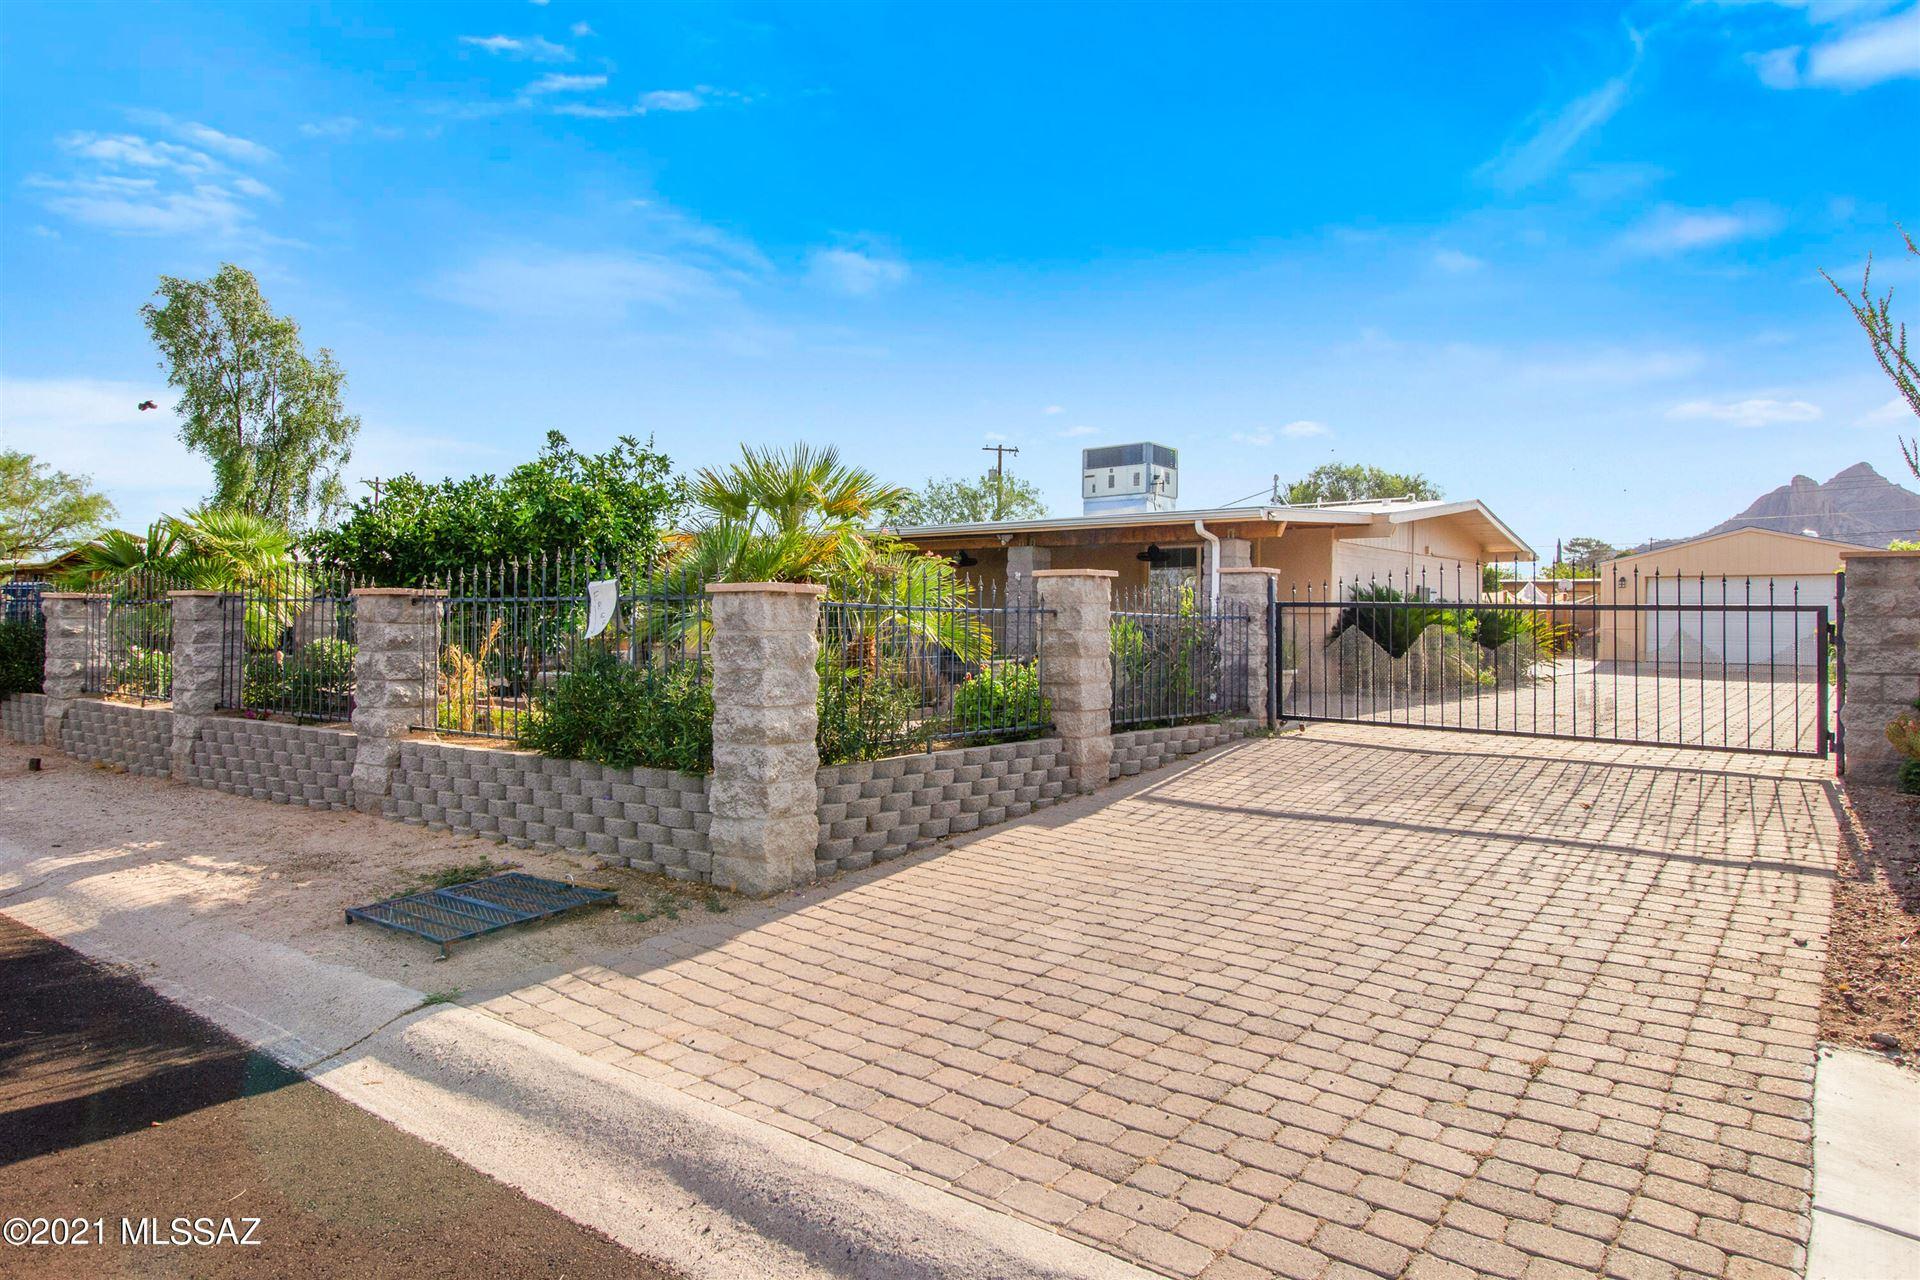 5602 S Meadowlark Avenue, Tucson, AZ 85746 - MLS#: 22117329